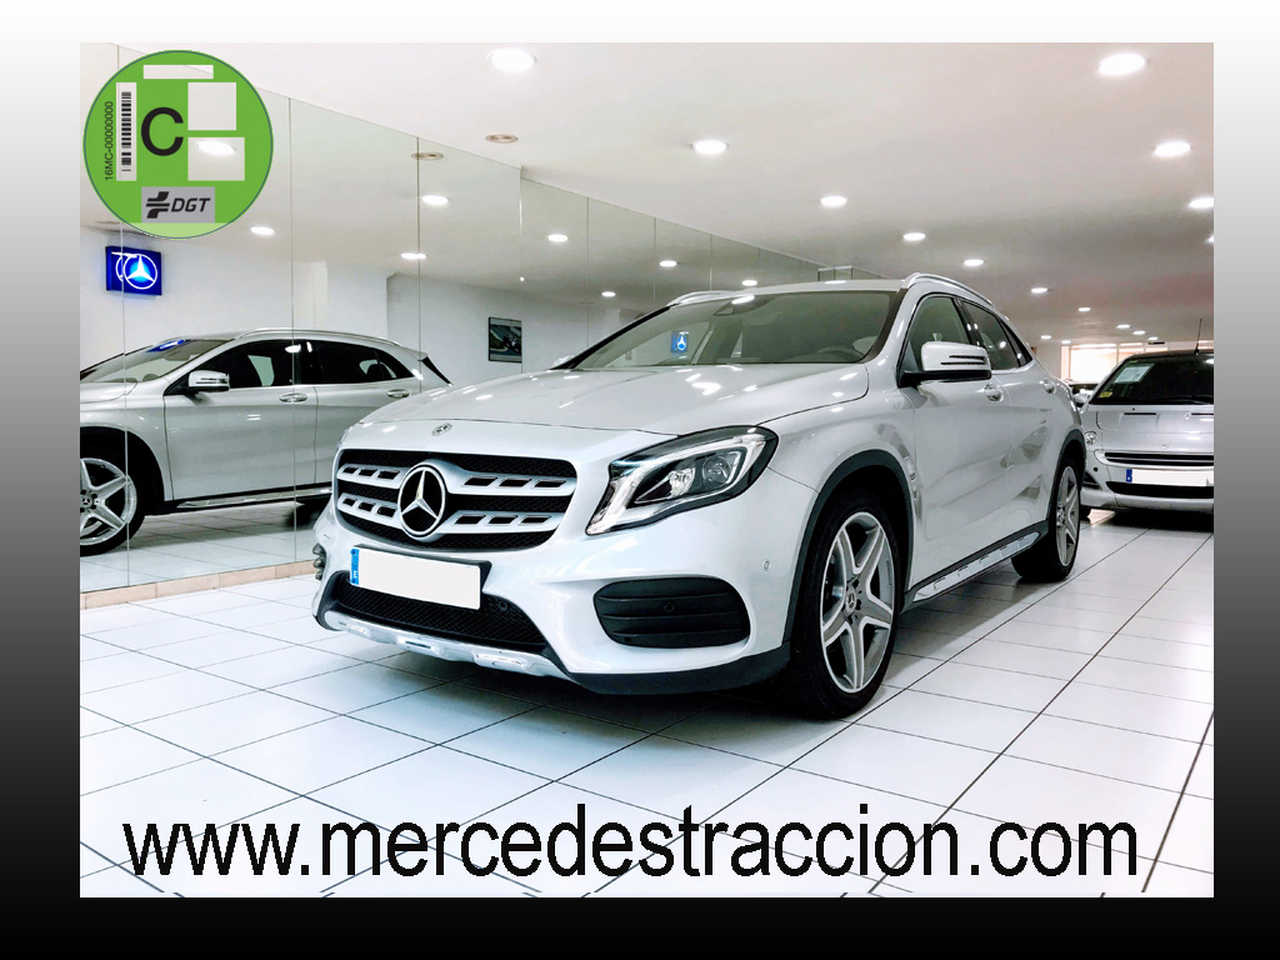 "Mercedes GLA 220 d AMG Line 7G/Navegación/Parktronic/Llanta 19""   - Foto 1"